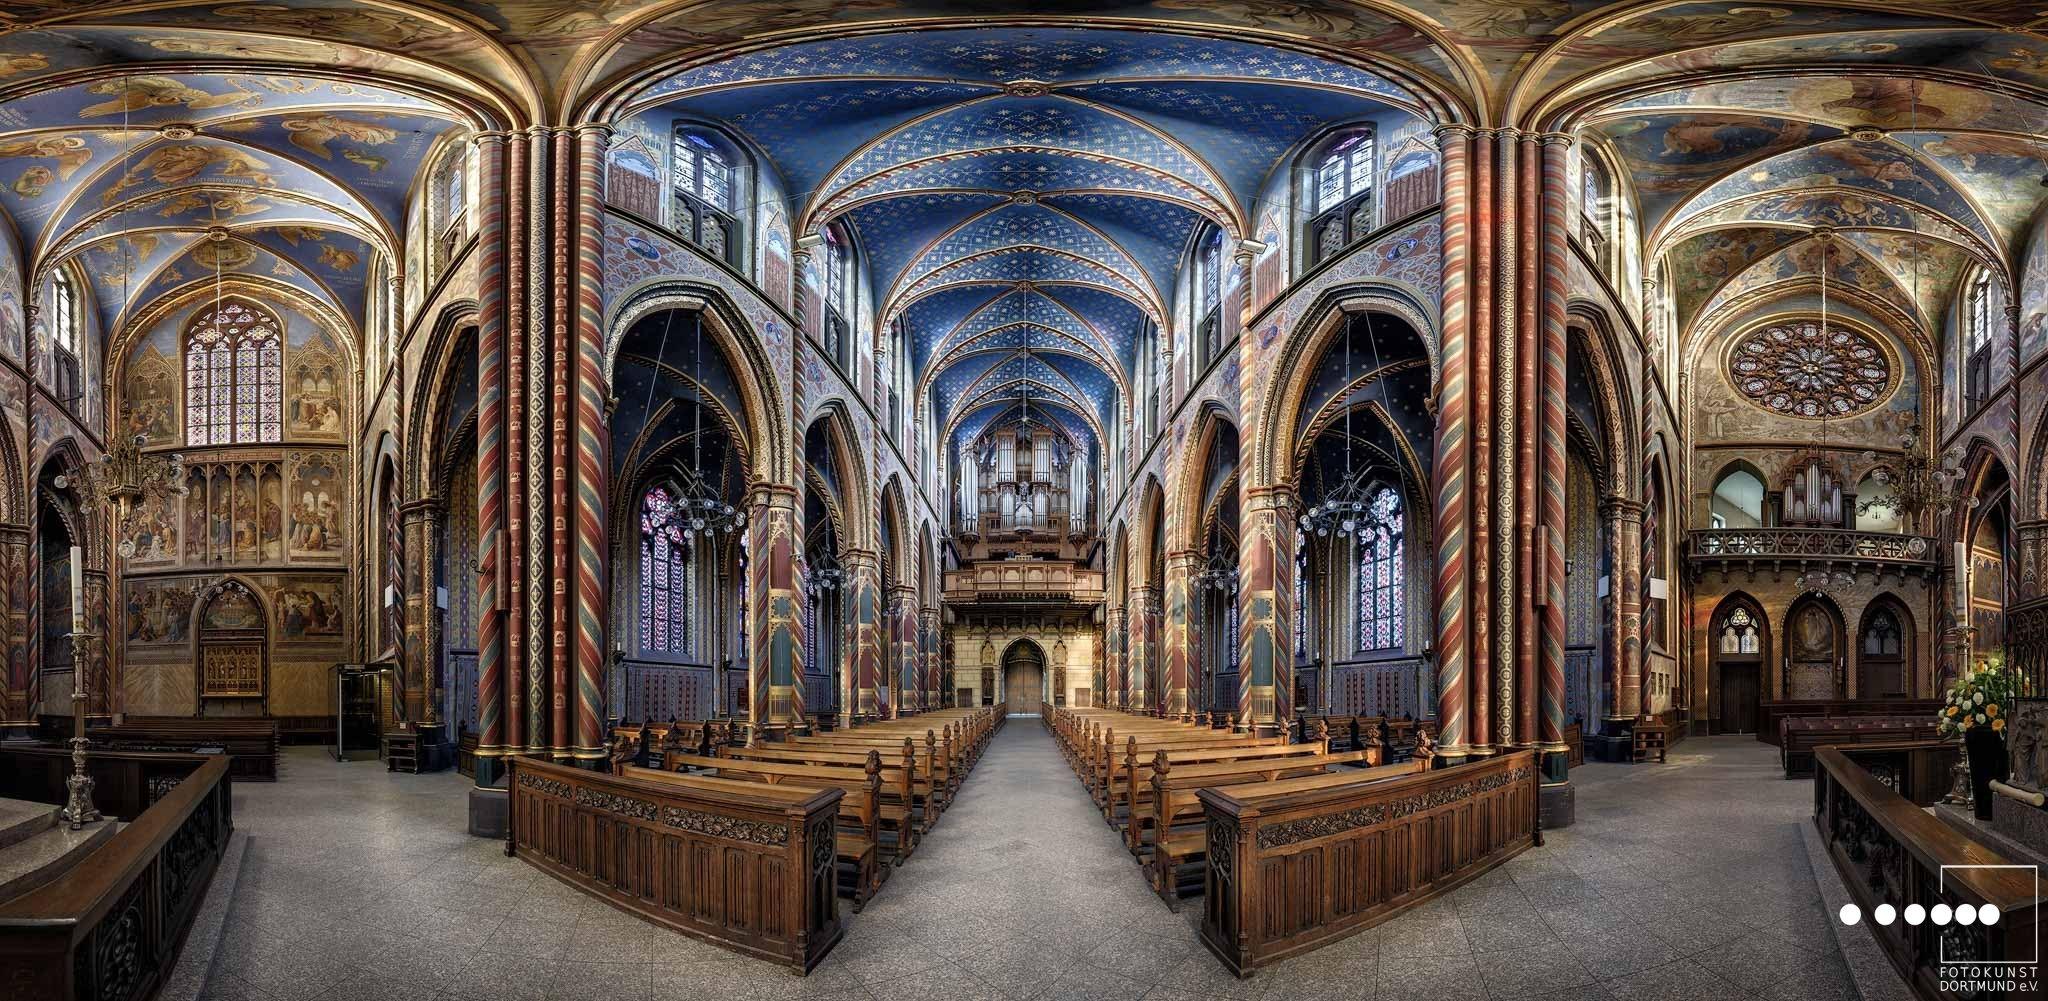 Wahlfahrtskirche  © Andreas Paehge